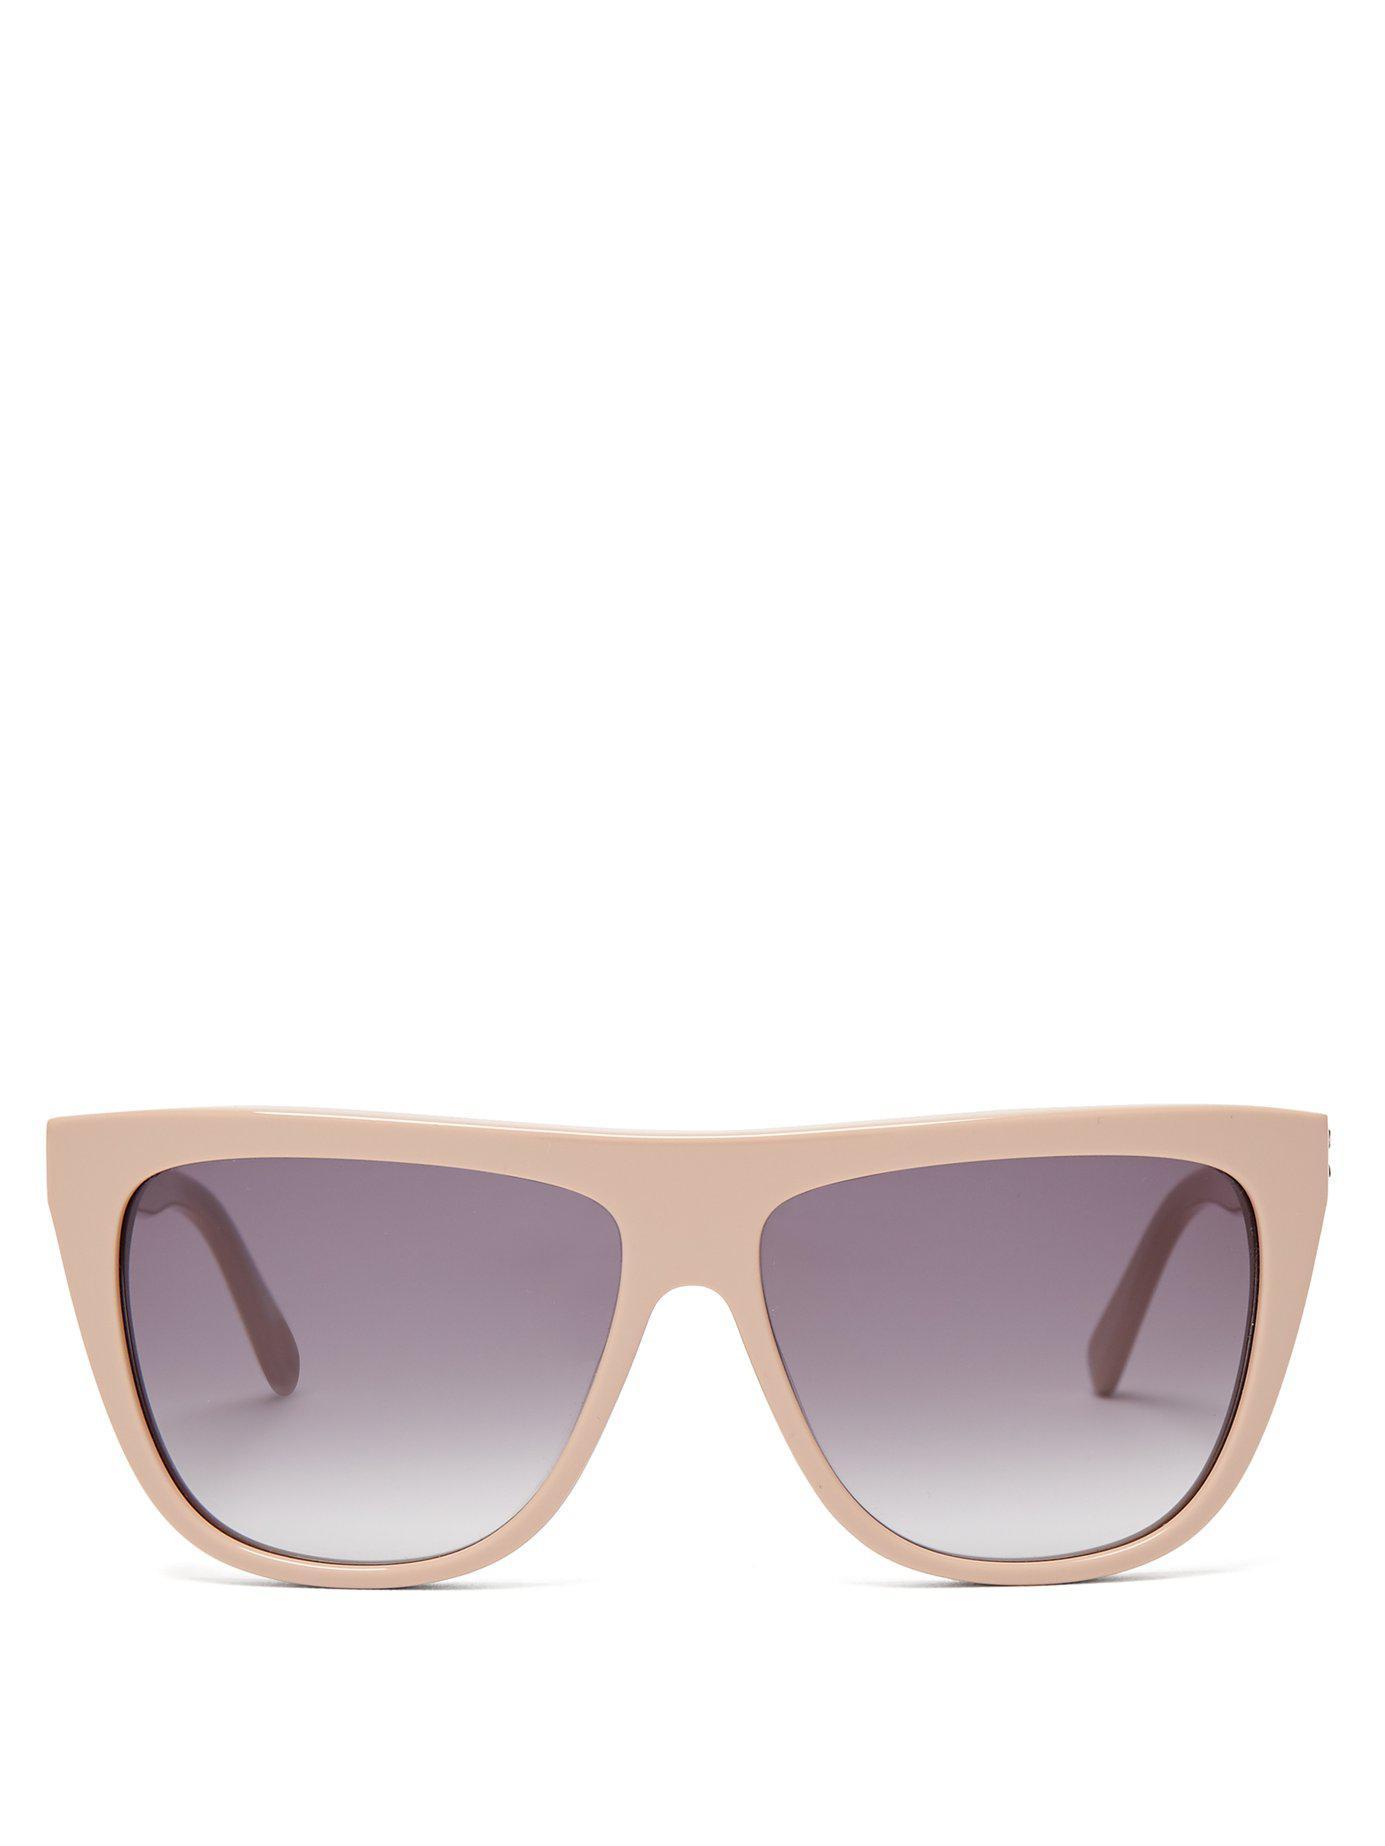 5683169ee8 Lyst - Stella McCartney Chain D Frame Sunglasses